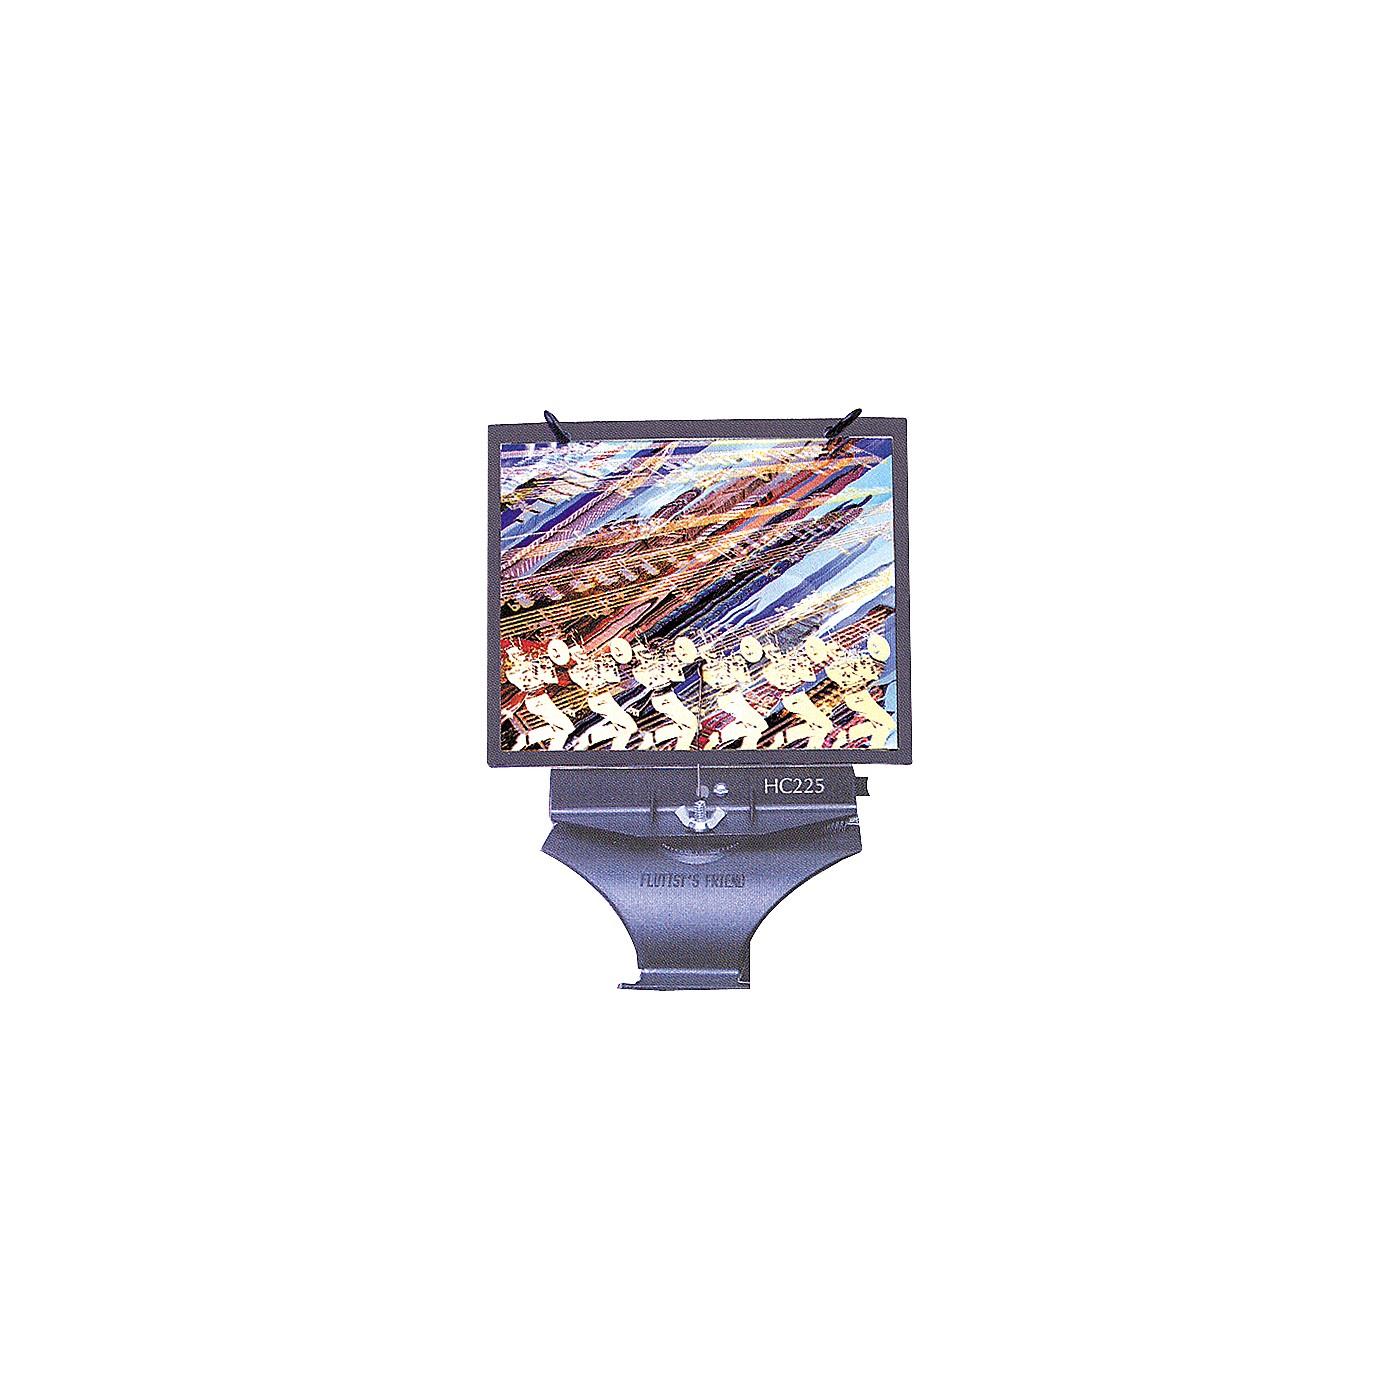 DEG A16-HC225 Flutist's Friend Flute/Piccolo Lyre thumbnail